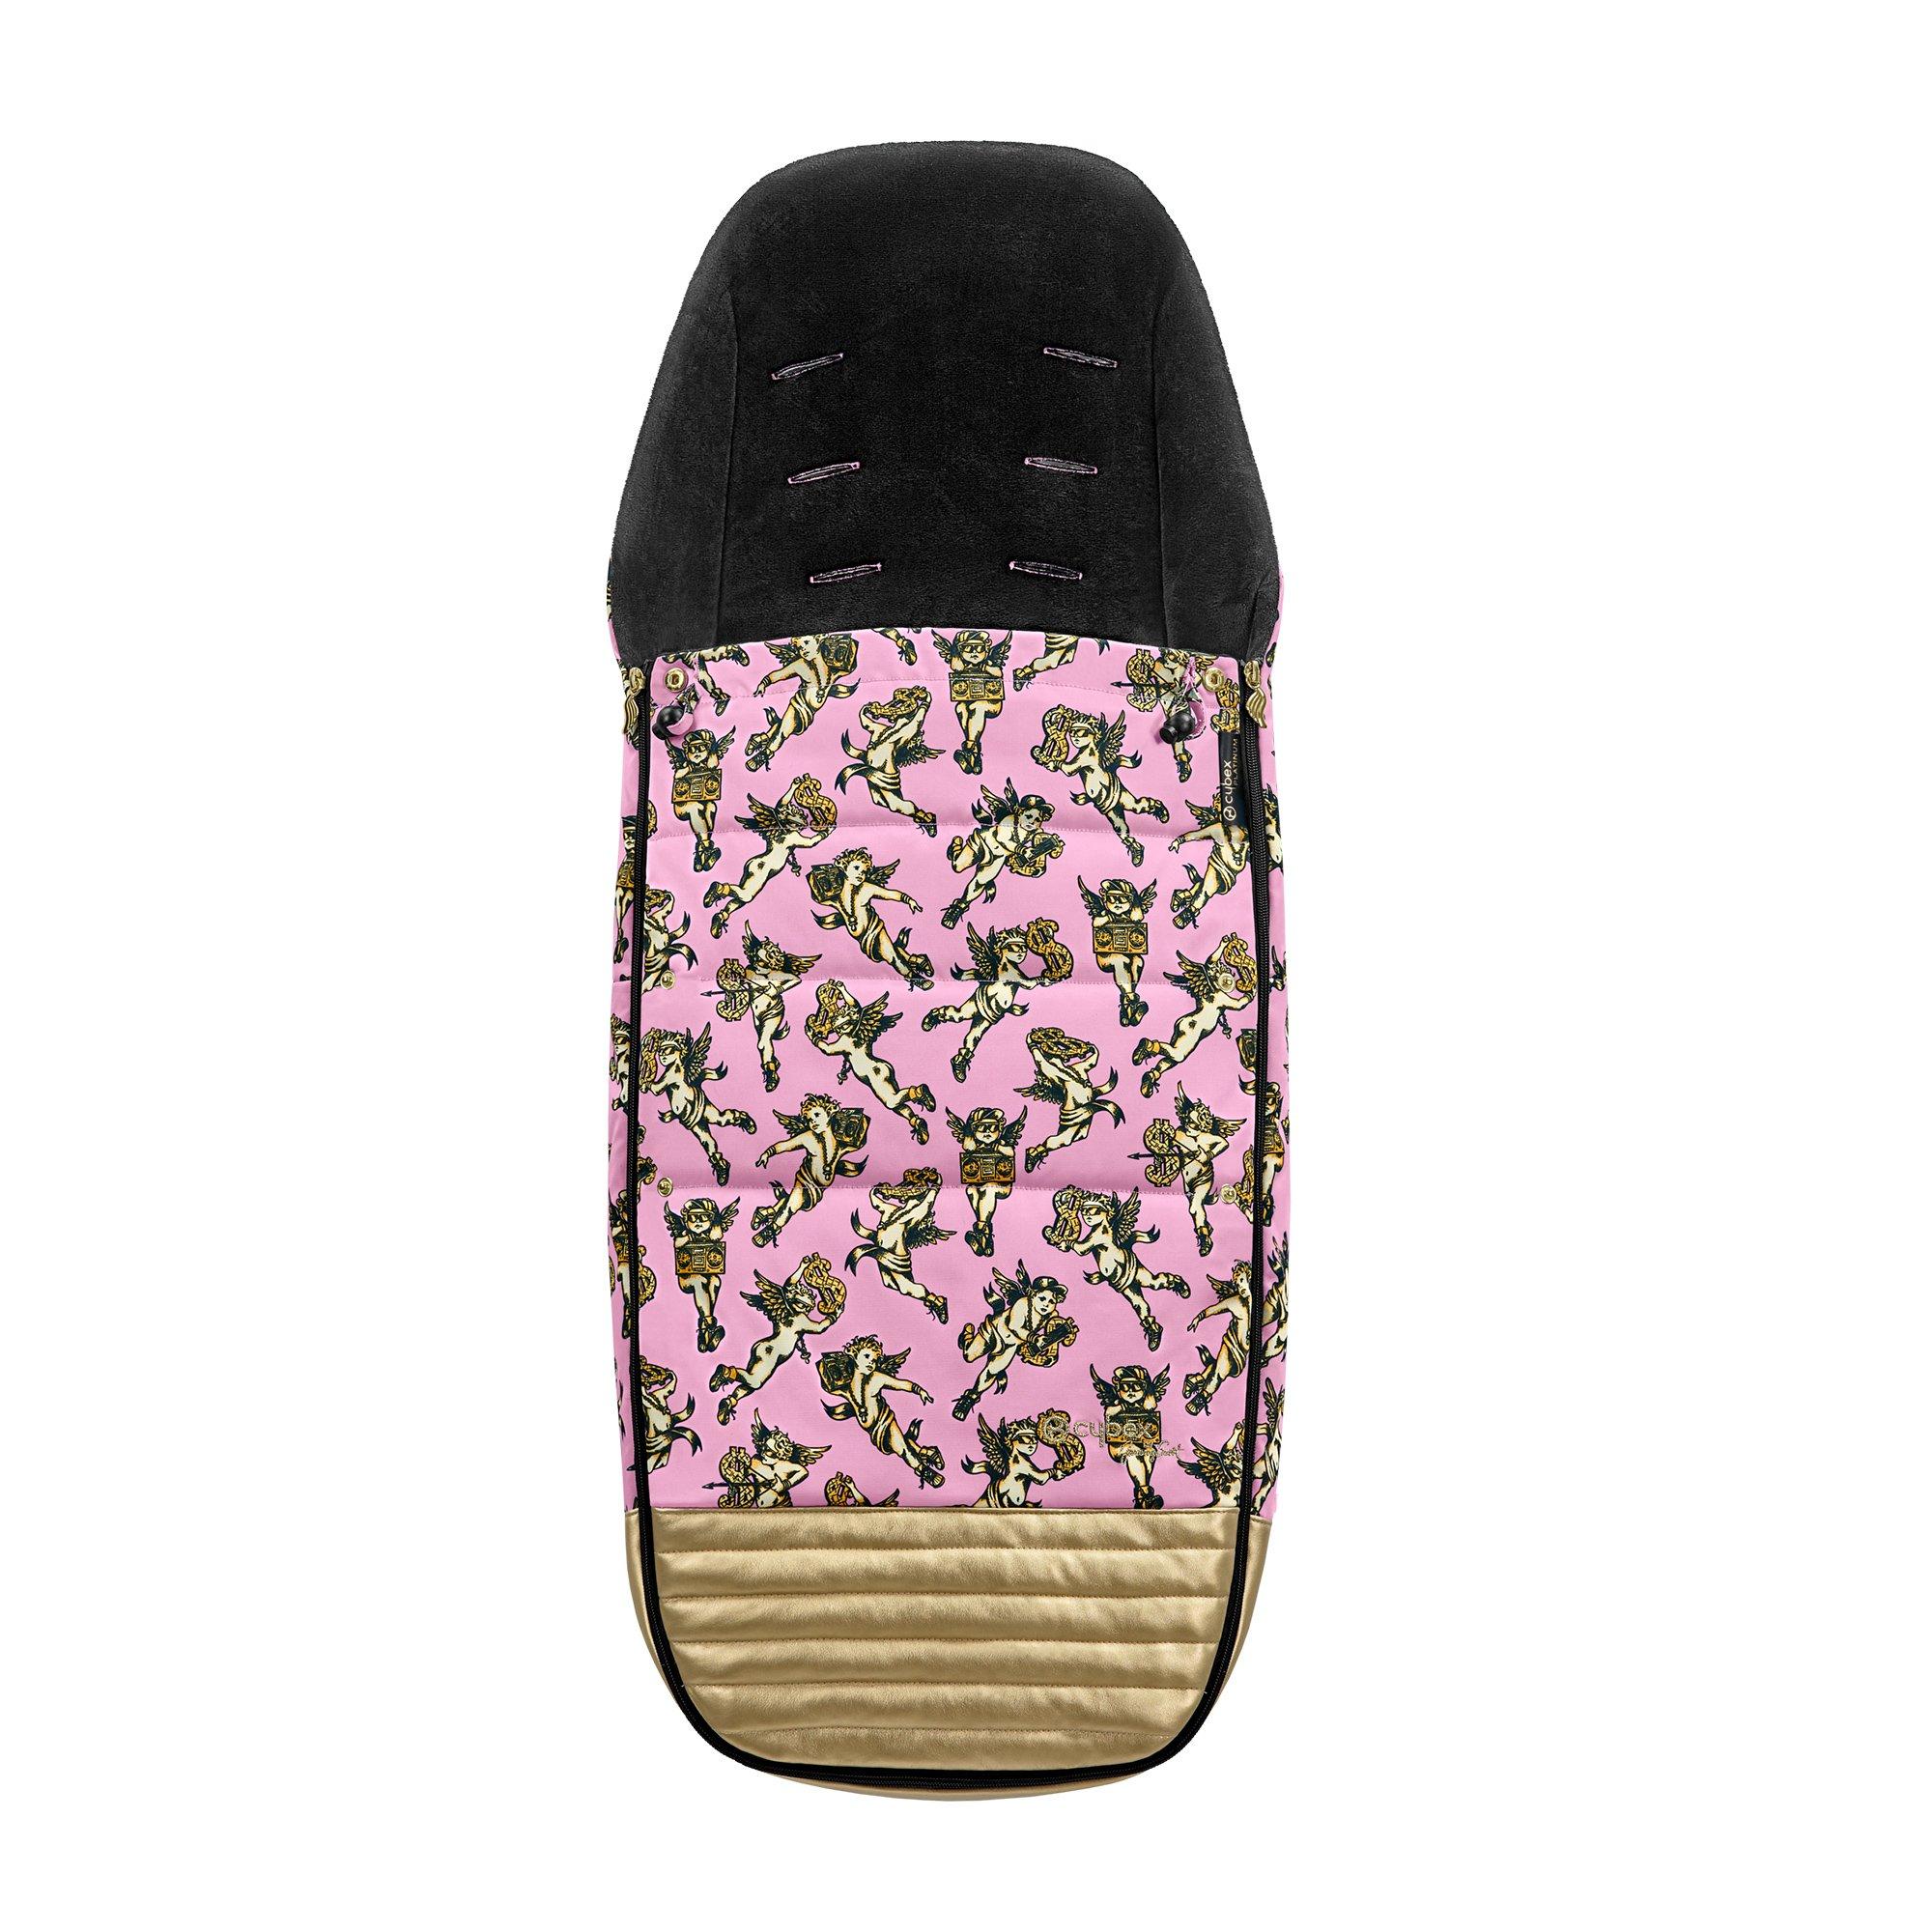 Bērnu ratu guļammaiss Cybex FOOTMUFF Cherub Pink by Jeremy Scott